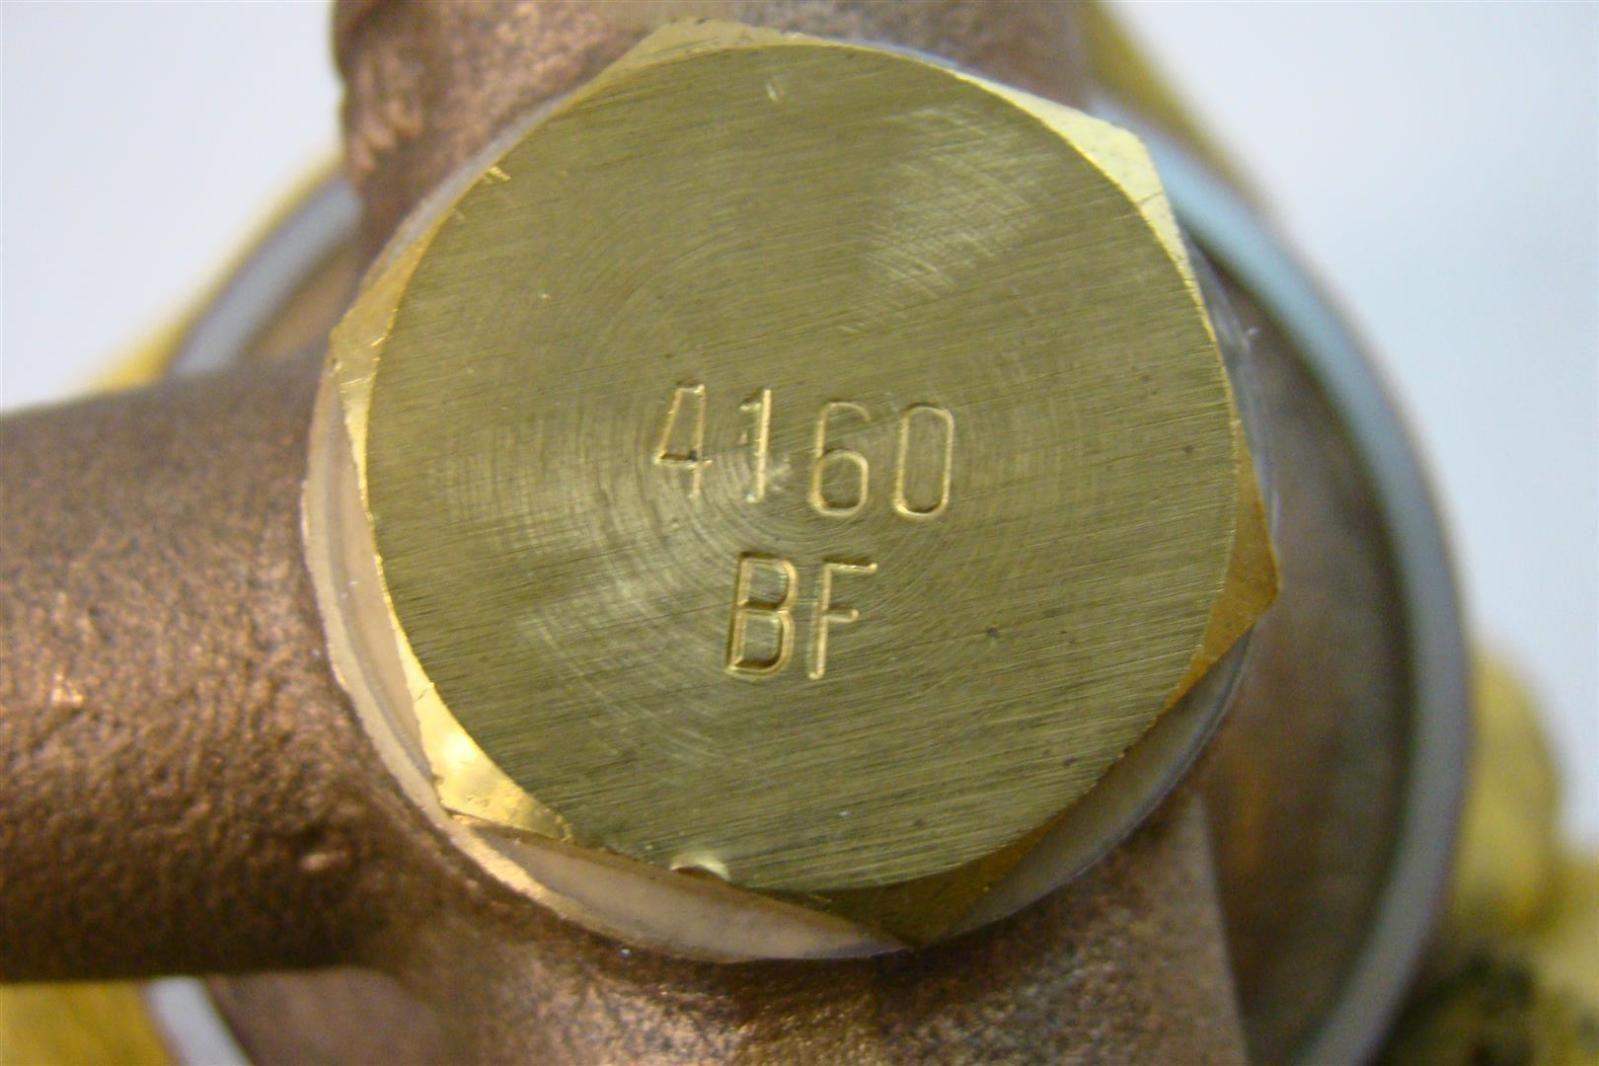 cash acme pressure regulator water air gas bf 10 50 range 4160 0035 joseph. Black Bedroom Furniture Sets. Home Design Ideas